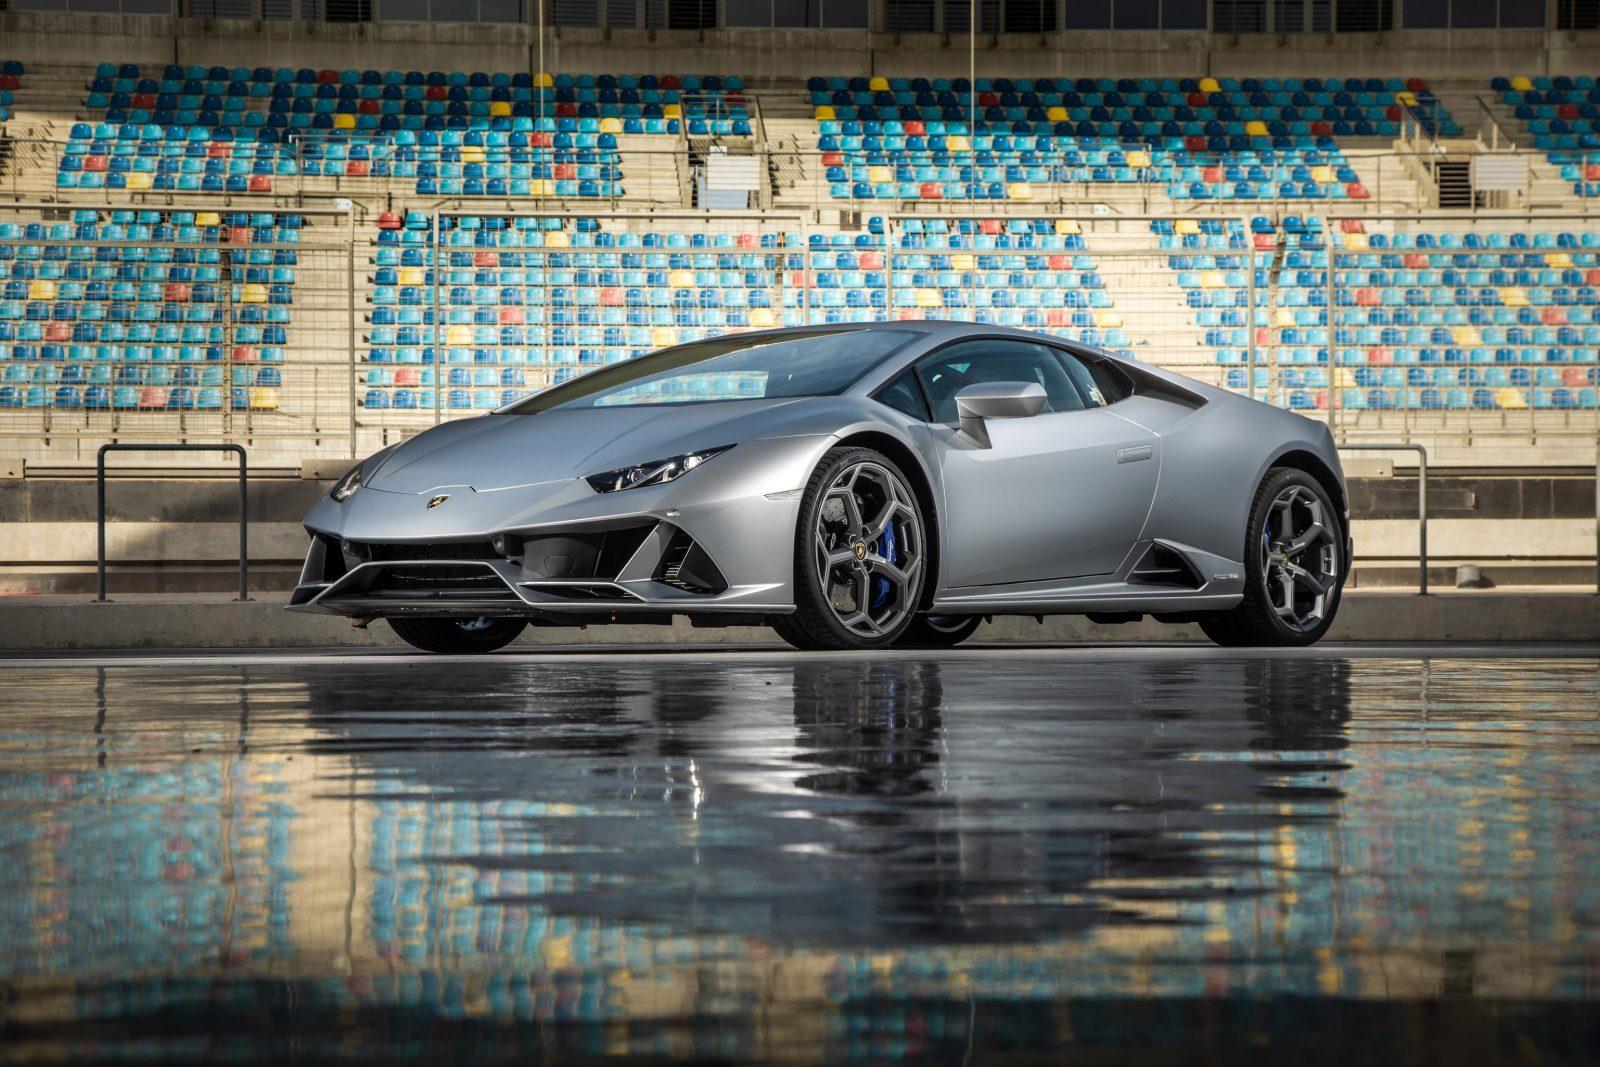 Lamborghini Amazon Alexa (1)